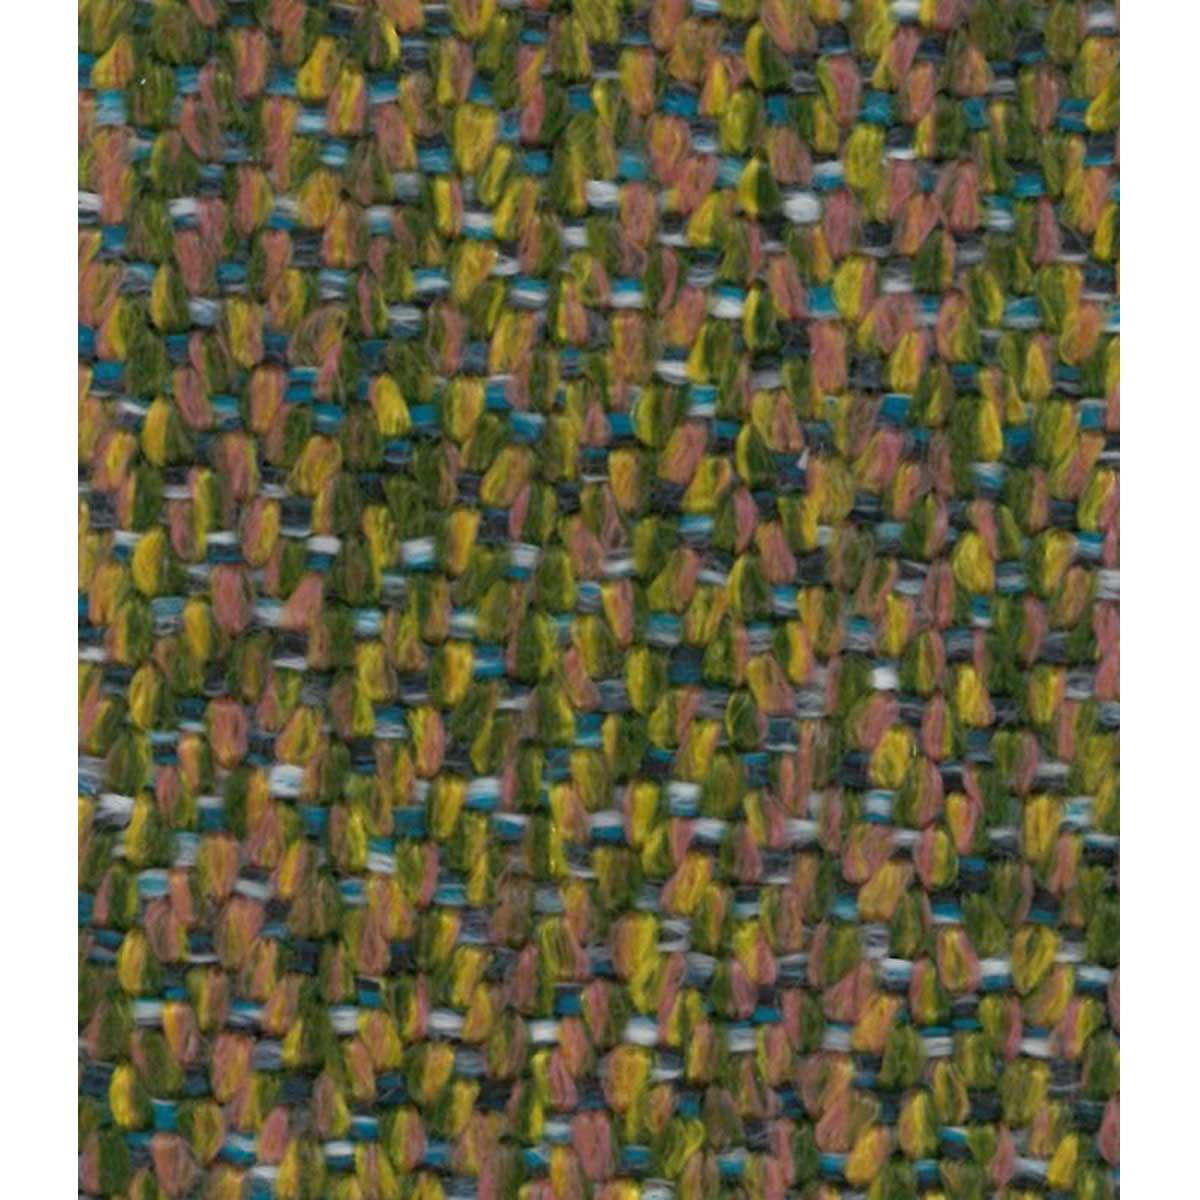 Tissu outdoor effet lainage - Vert mousse - 1.4 m